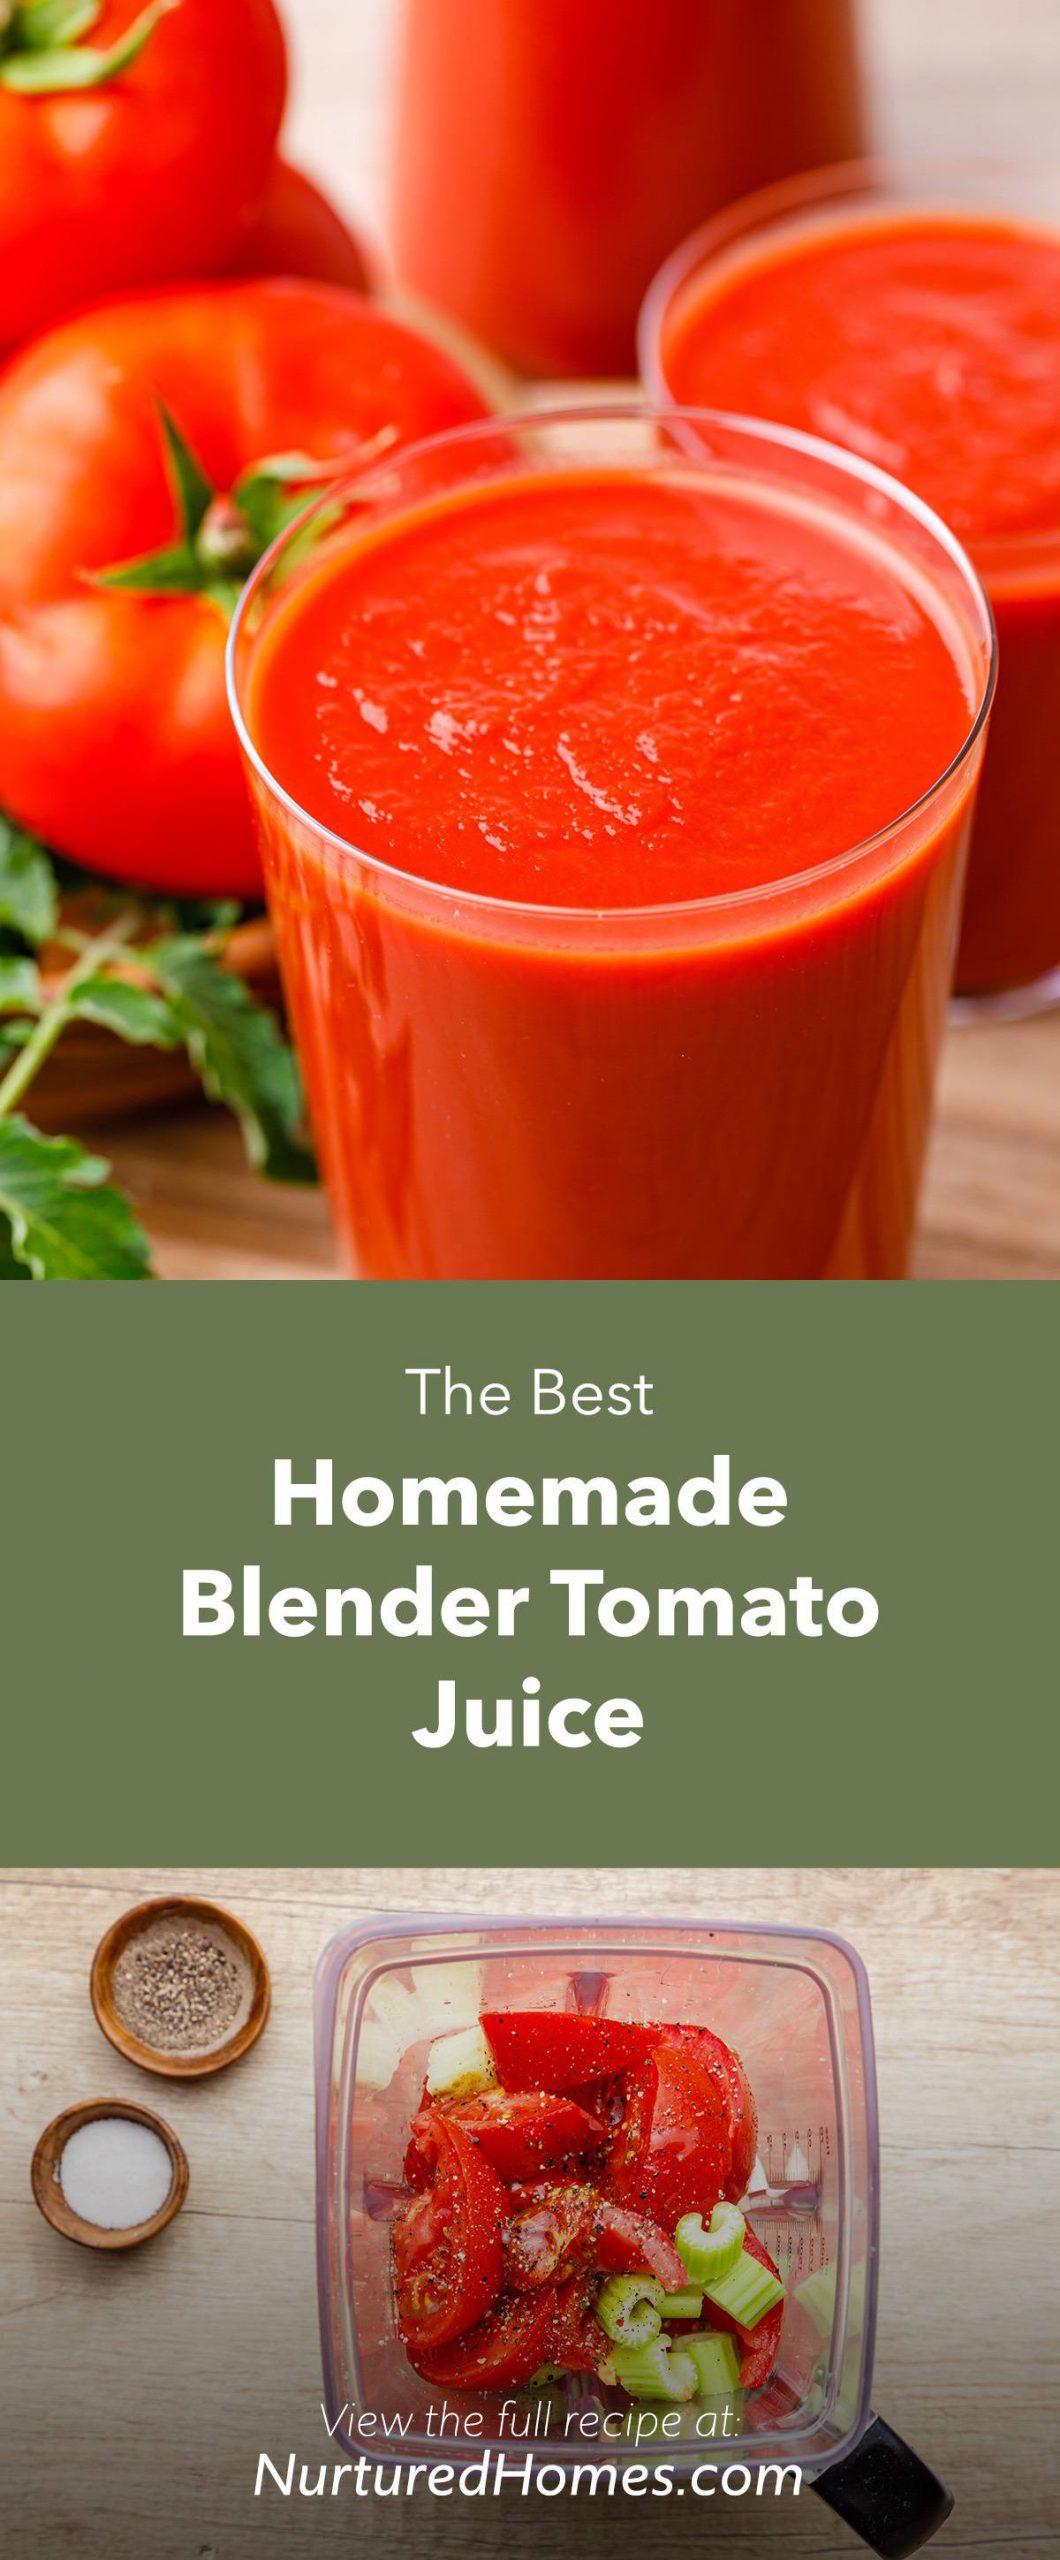 The Best Homemade Tomato Juice